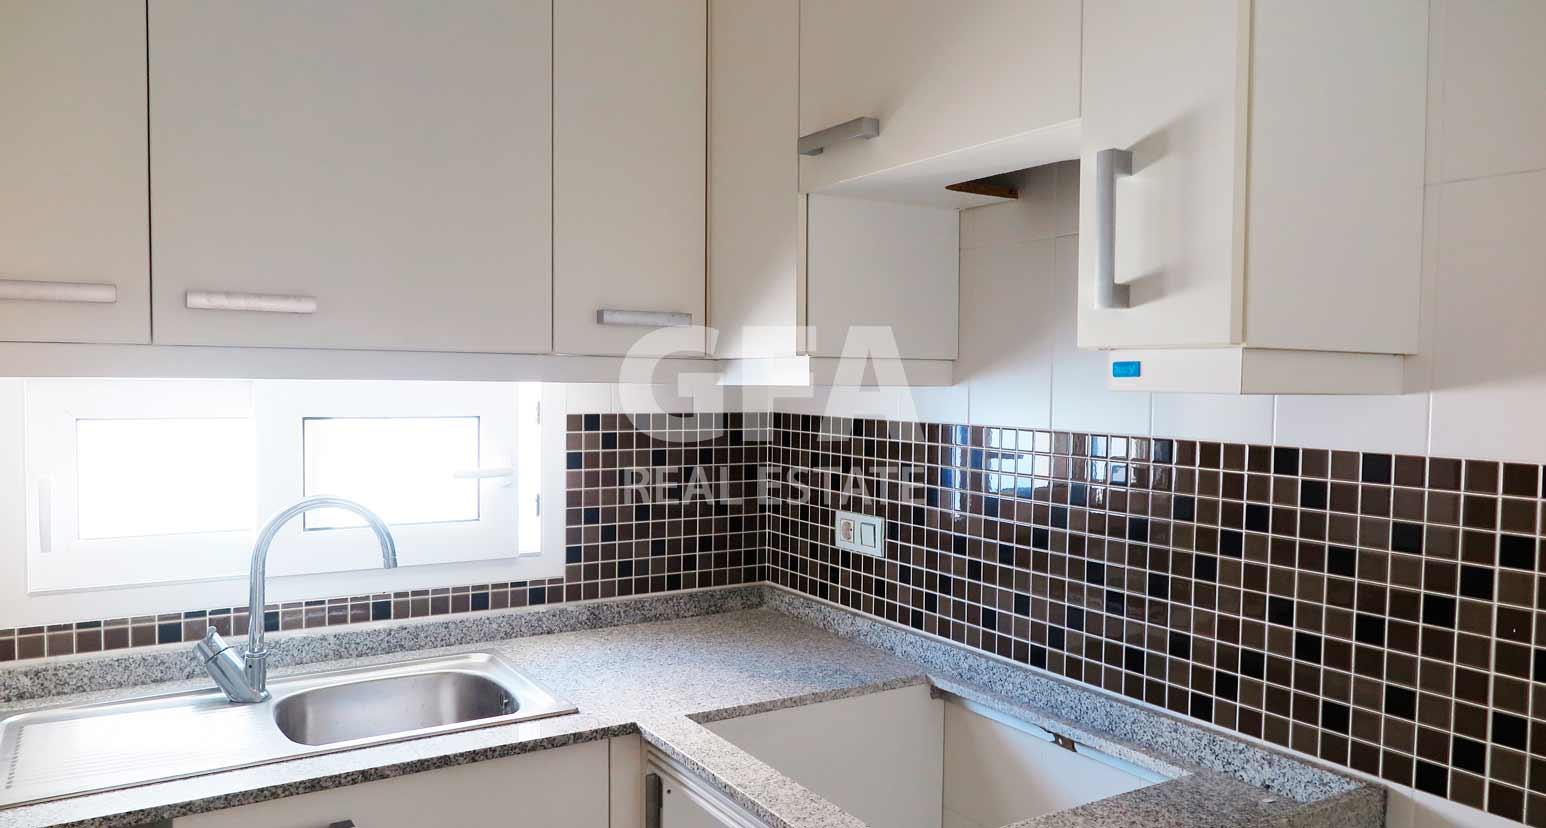 pisos-venta-la-manga-cocina-2